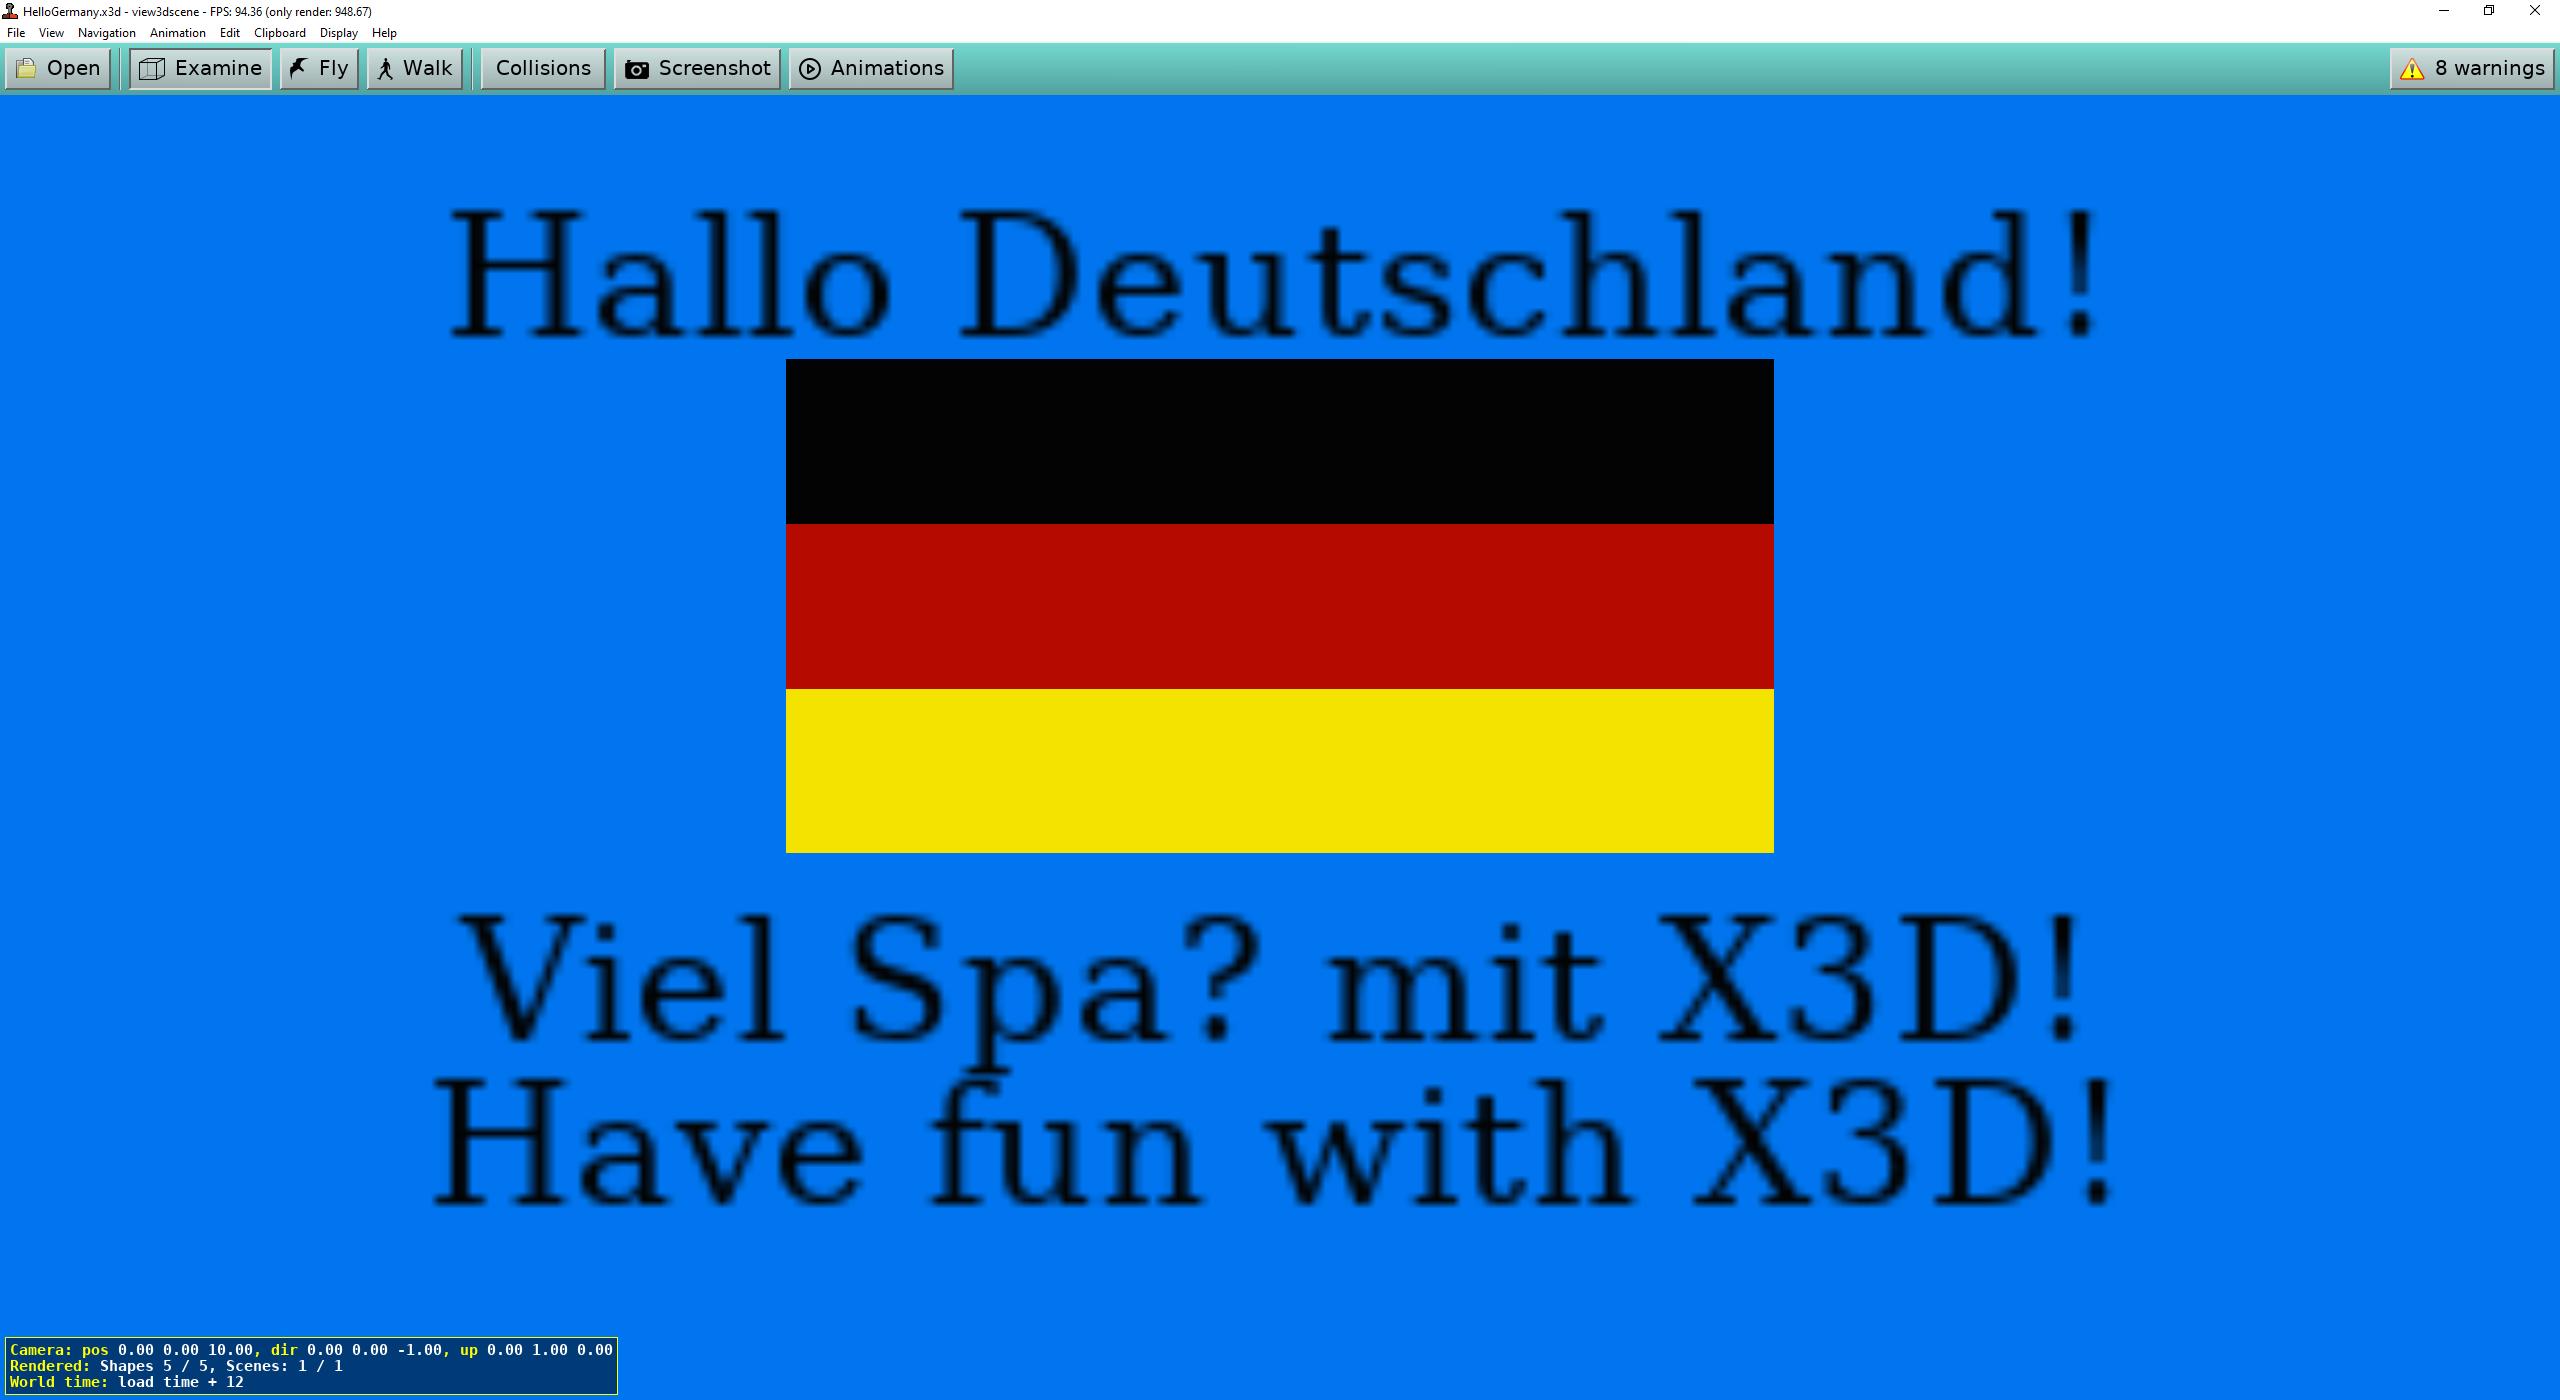 BrennenstuhlTobias/Screenshots/Player/Hello Germany/HelloGermany.view3DScene.png